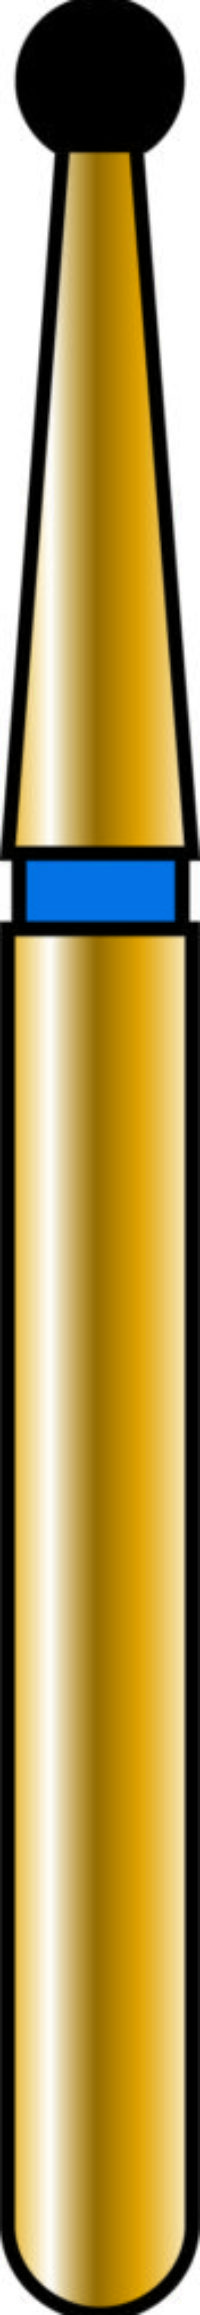 Round 14mm Gold Diamond Bur